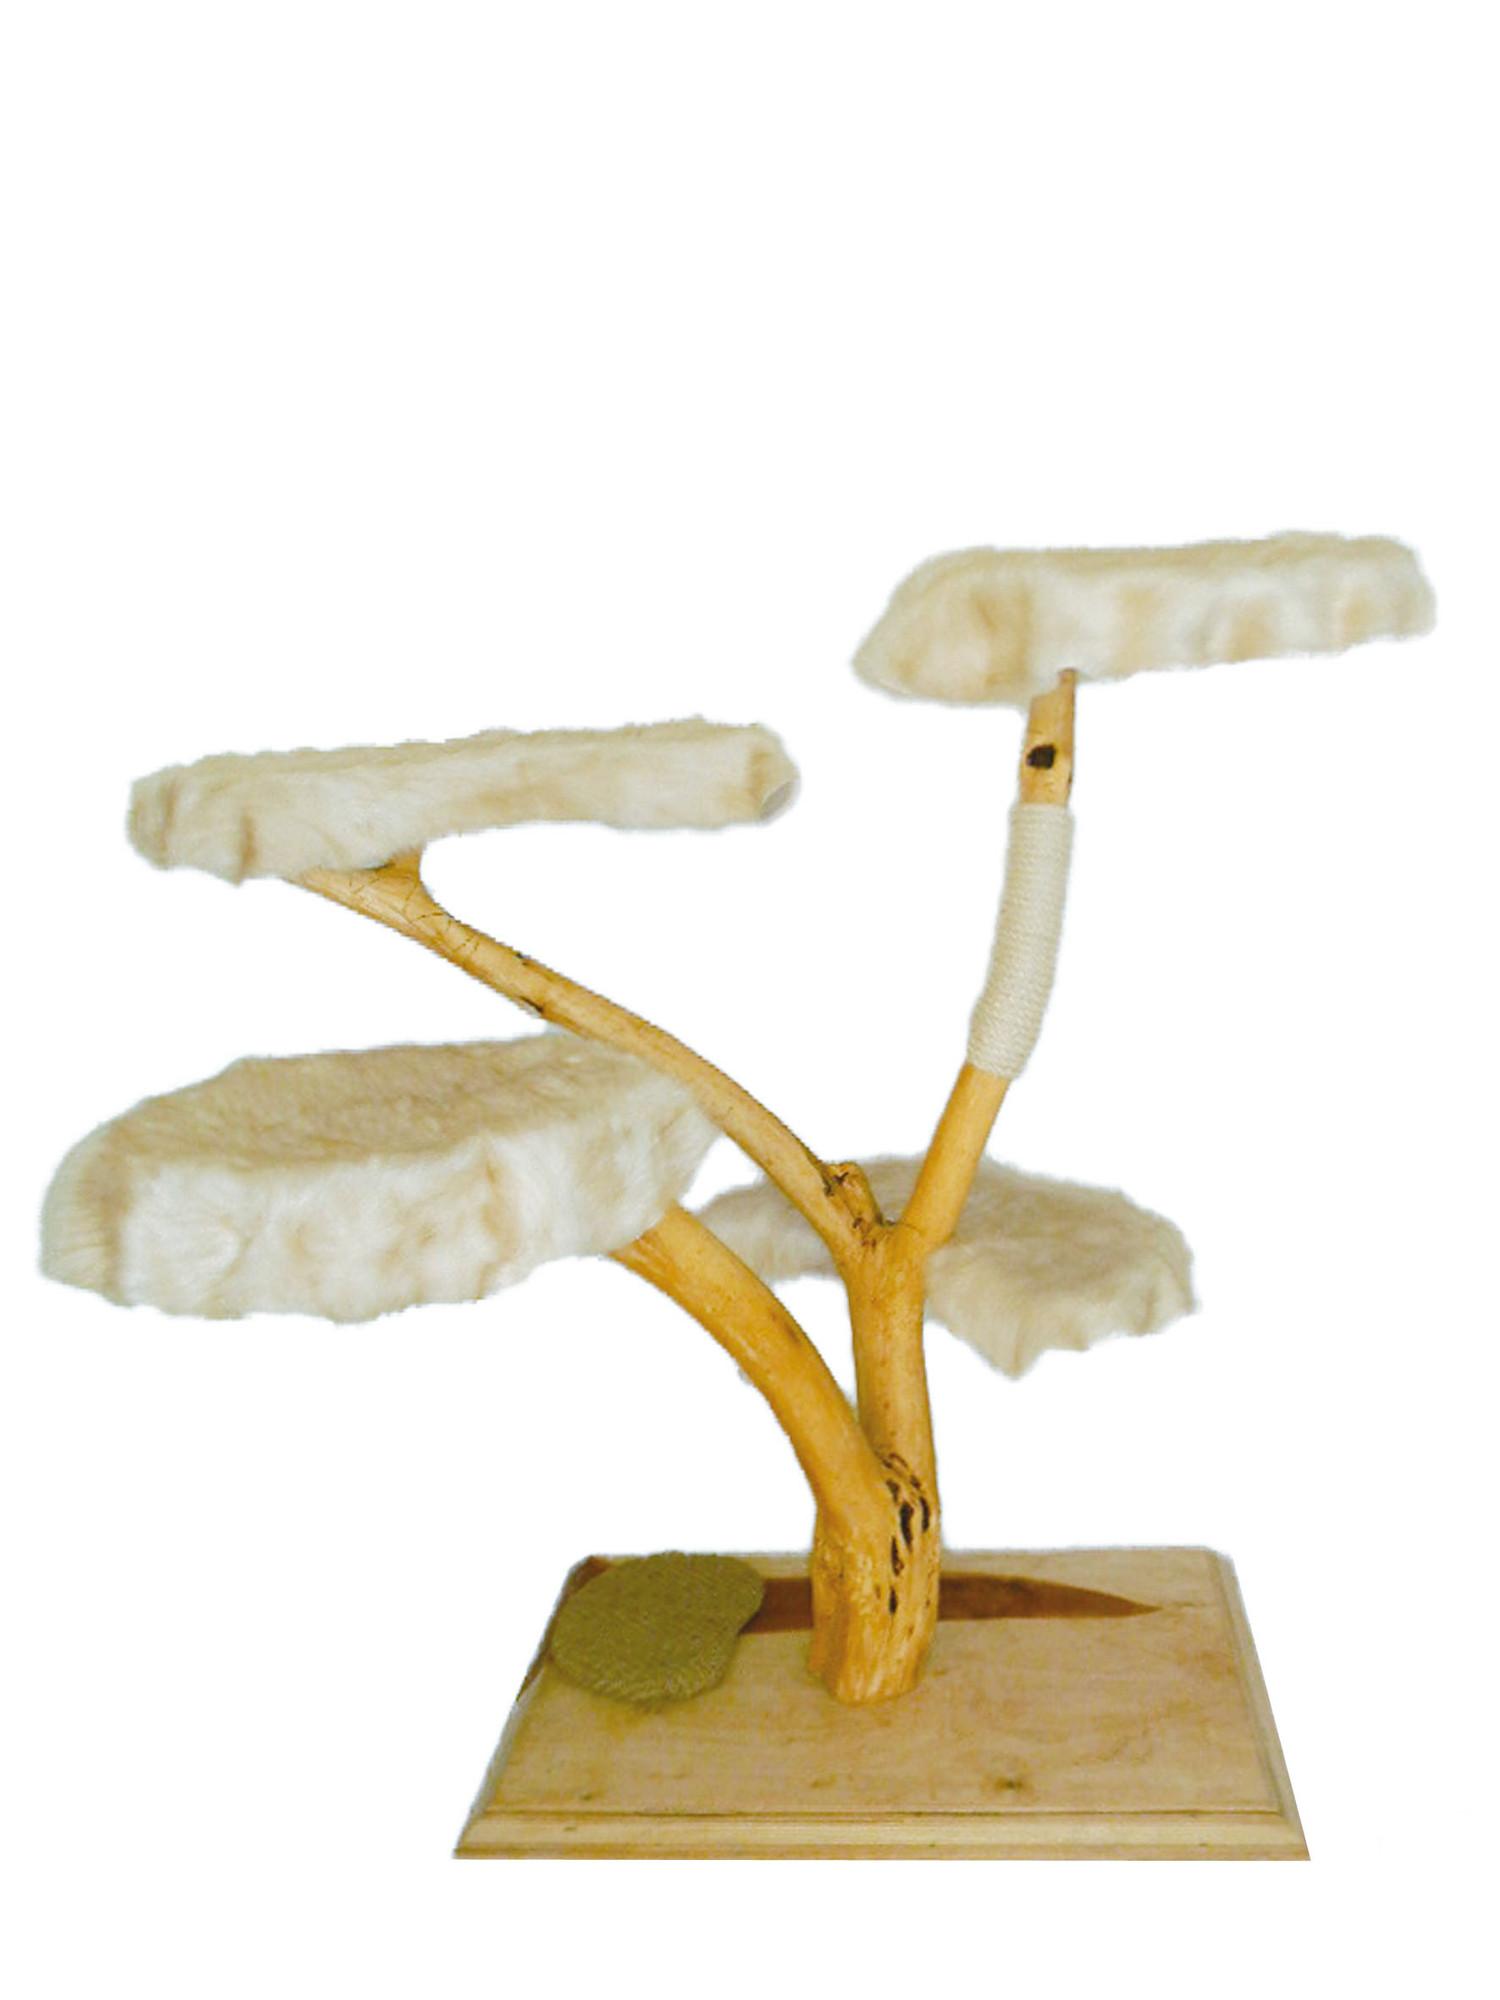 petcouture kratzbaum unikat 4190 weiß | mein-tiershop.de